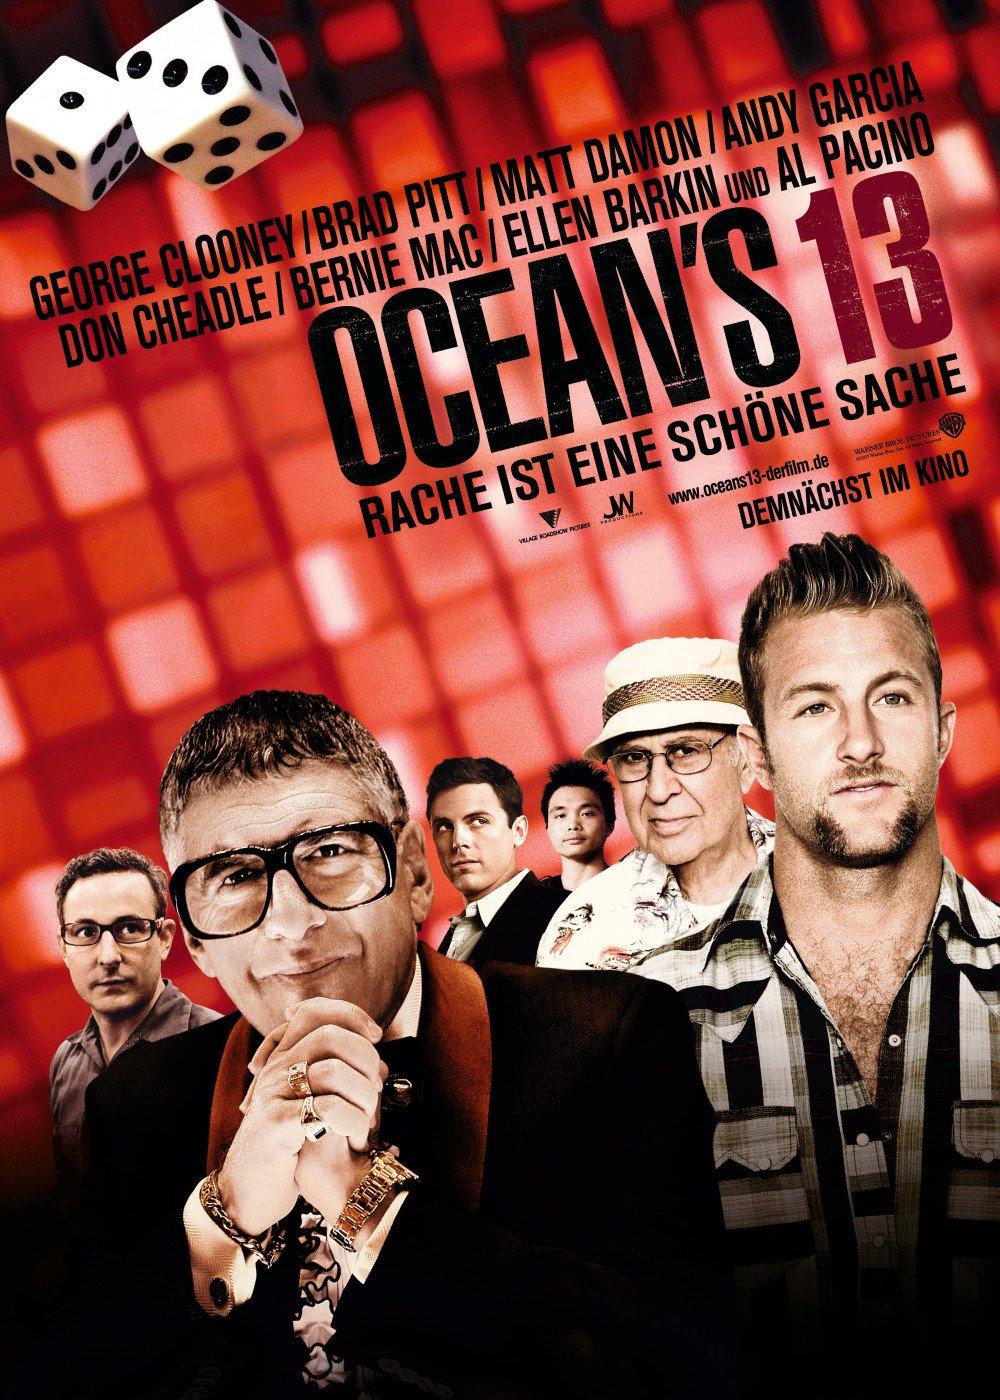 Ocean S Thirteen 2007 Poster Freemovieposters Net